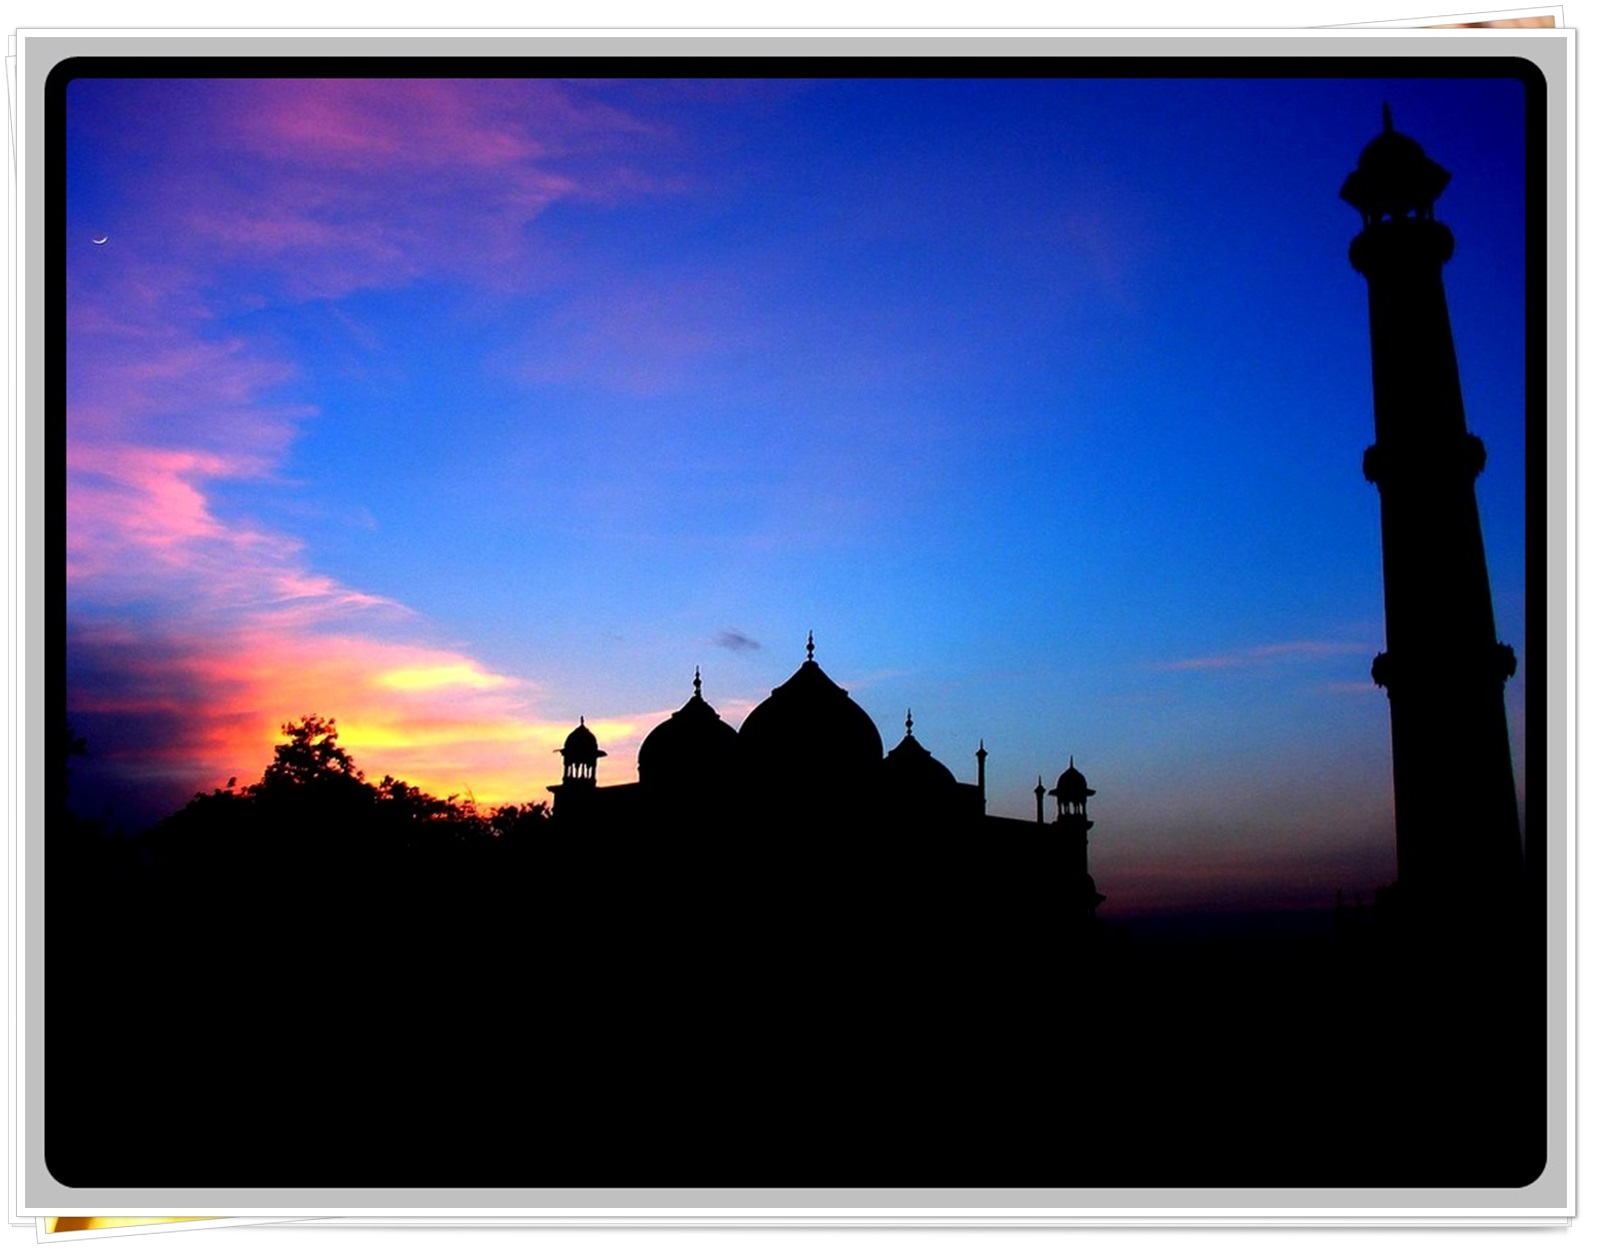 Kumpulan Gambar Wallpaper Pubg: Download Gambar Wallpaper Islami